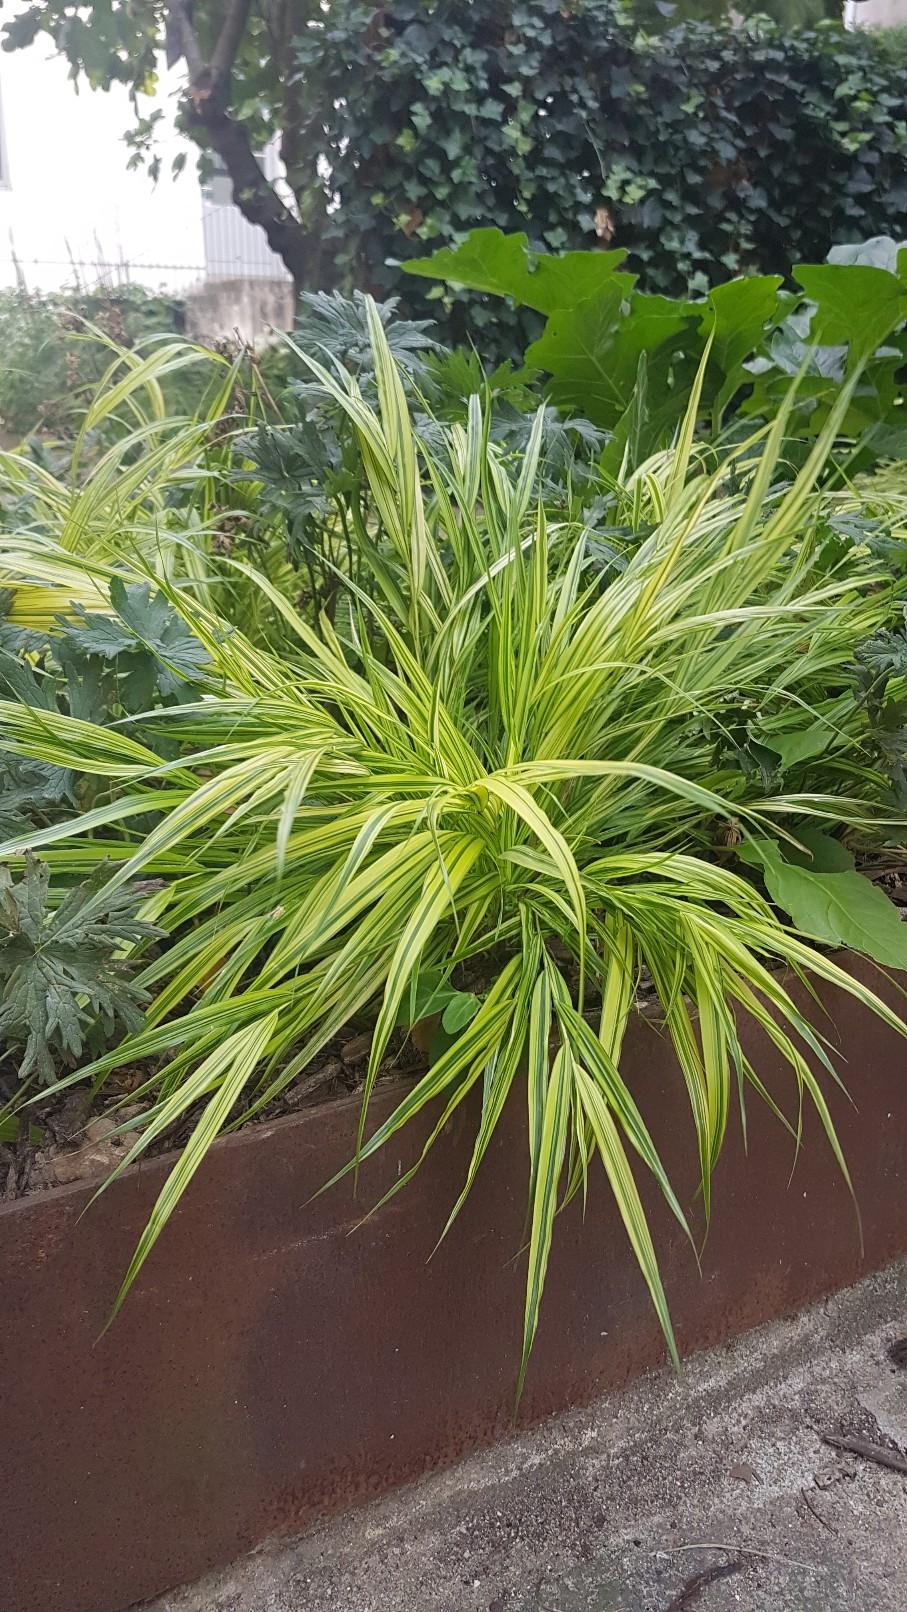 Hakonechloa macra, Chasmanthium latifolium, Euphorbia 'Diamond Frost' [identifications] 20180378